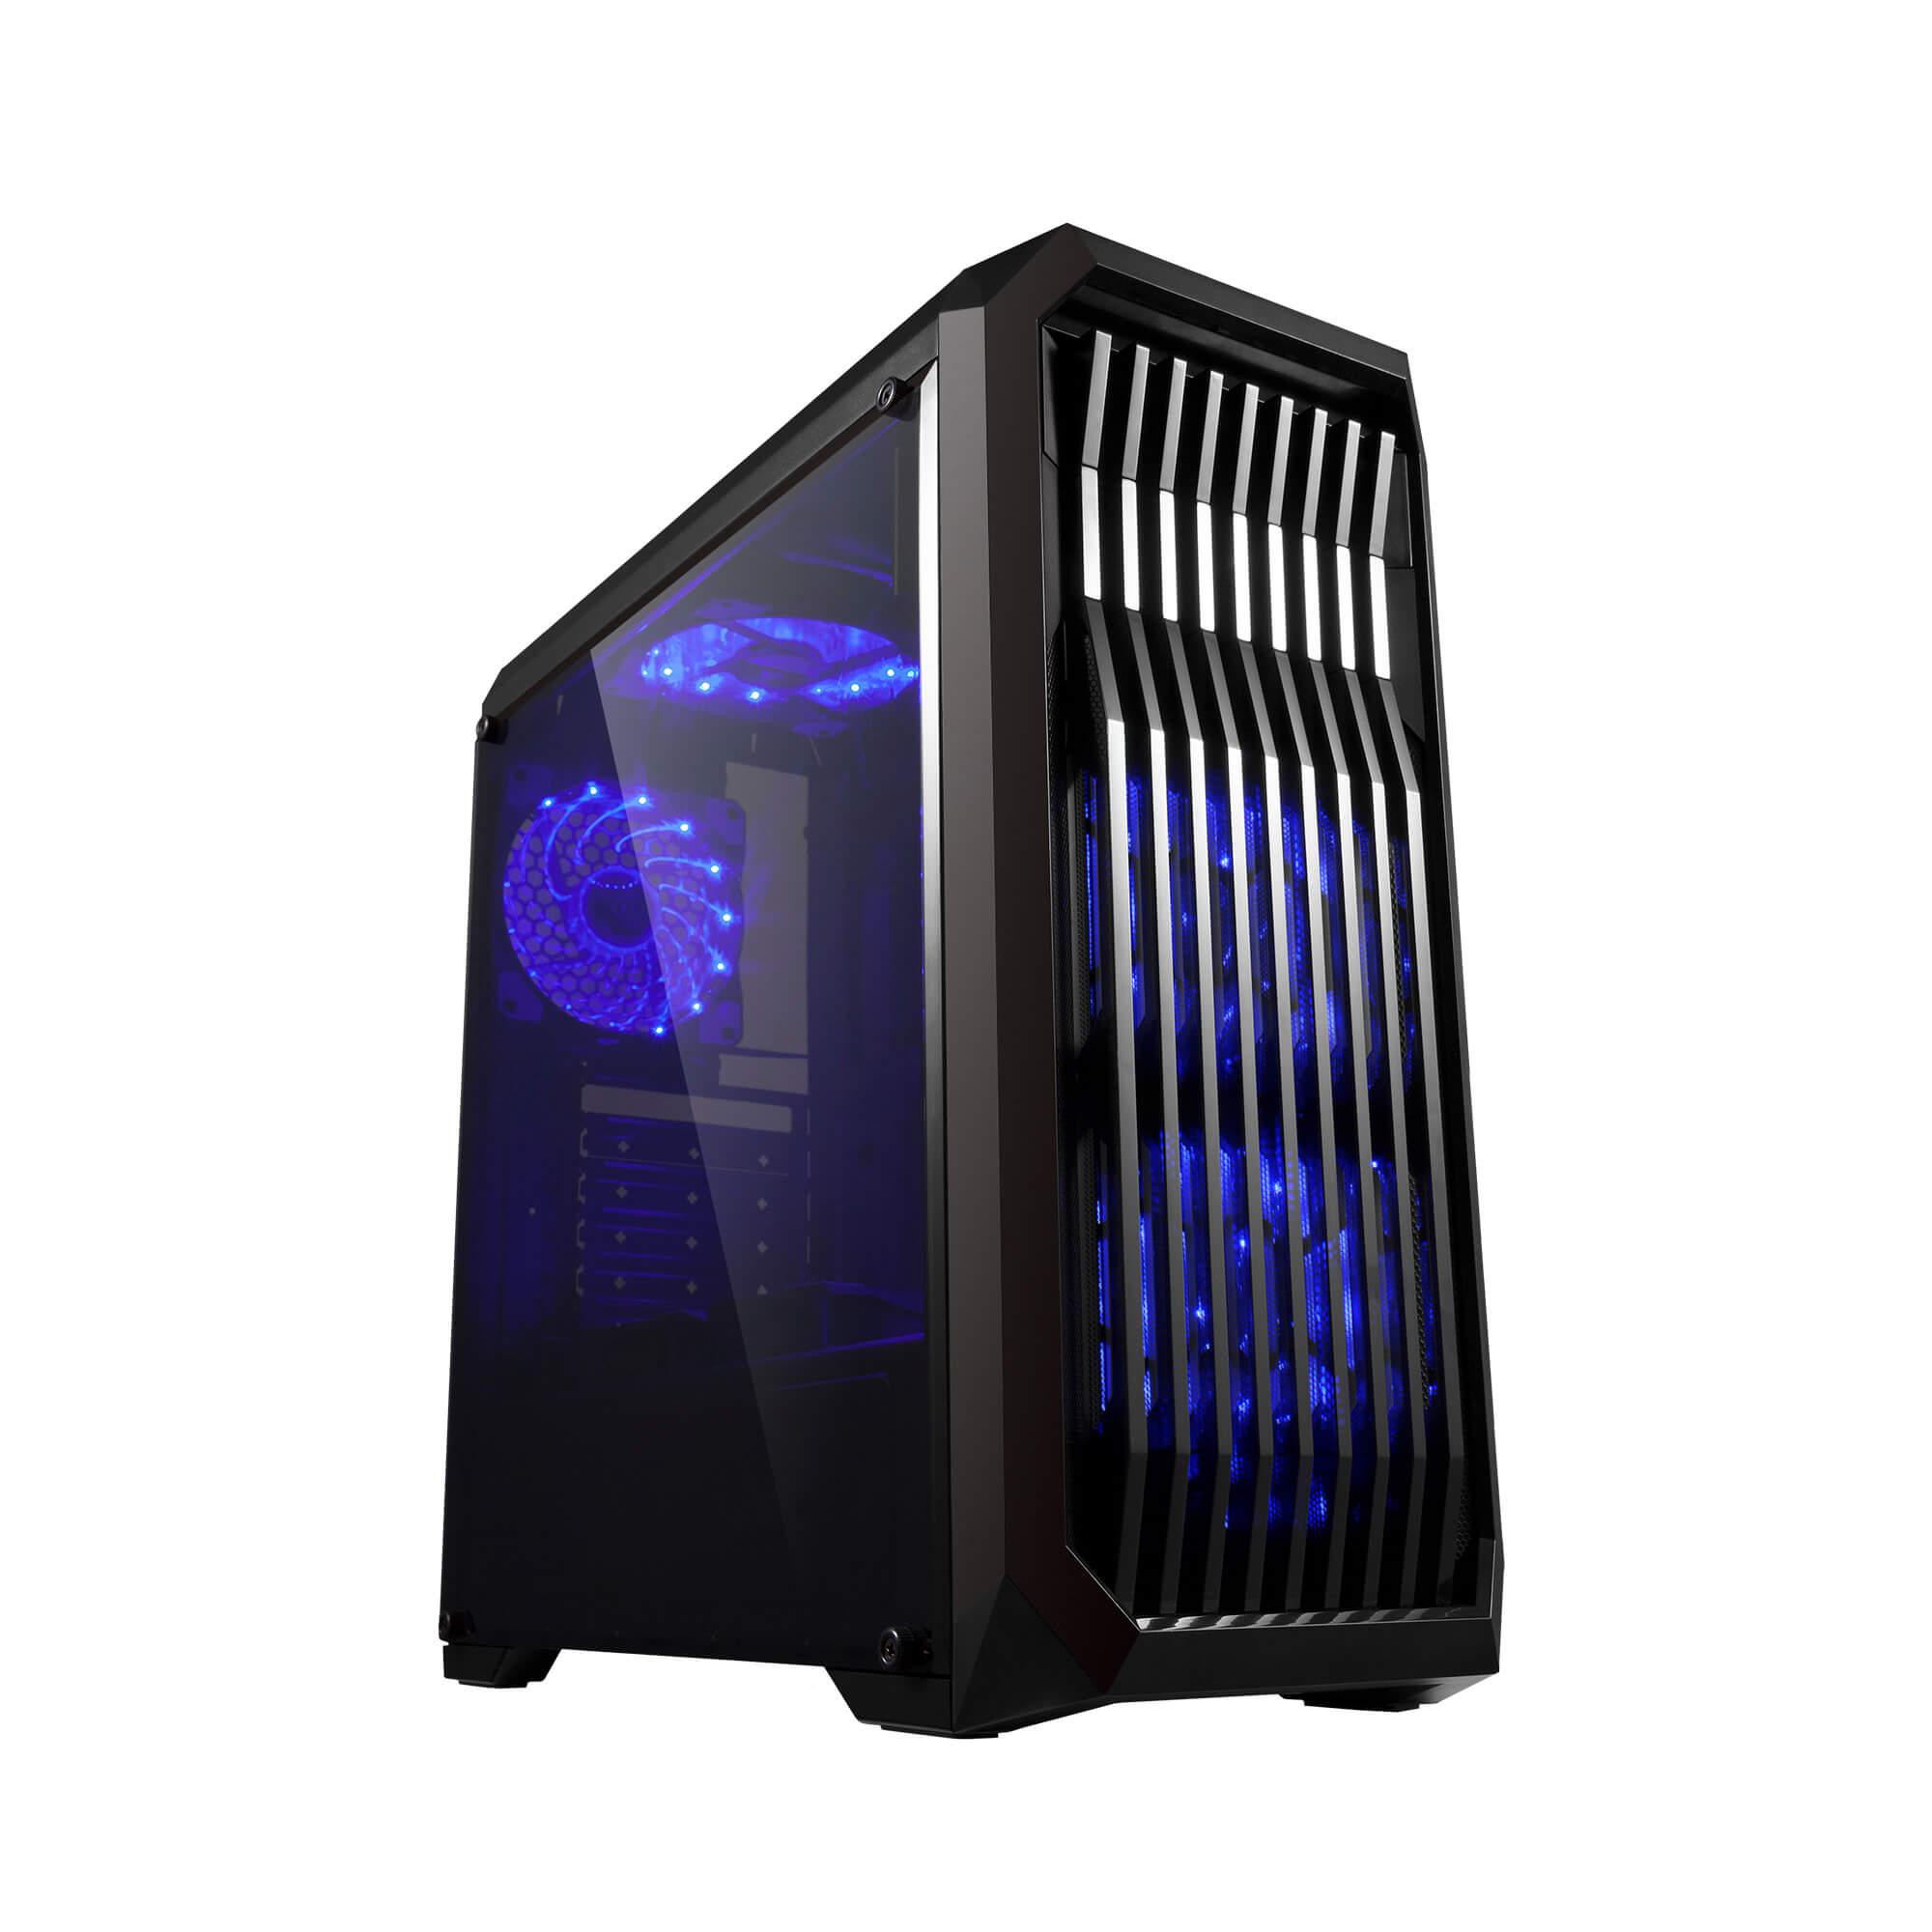 Gabinete Gamer Bluecase Bg-019 Preto - S/ Fonte / Usb 3.0 Frontal  - Fatality